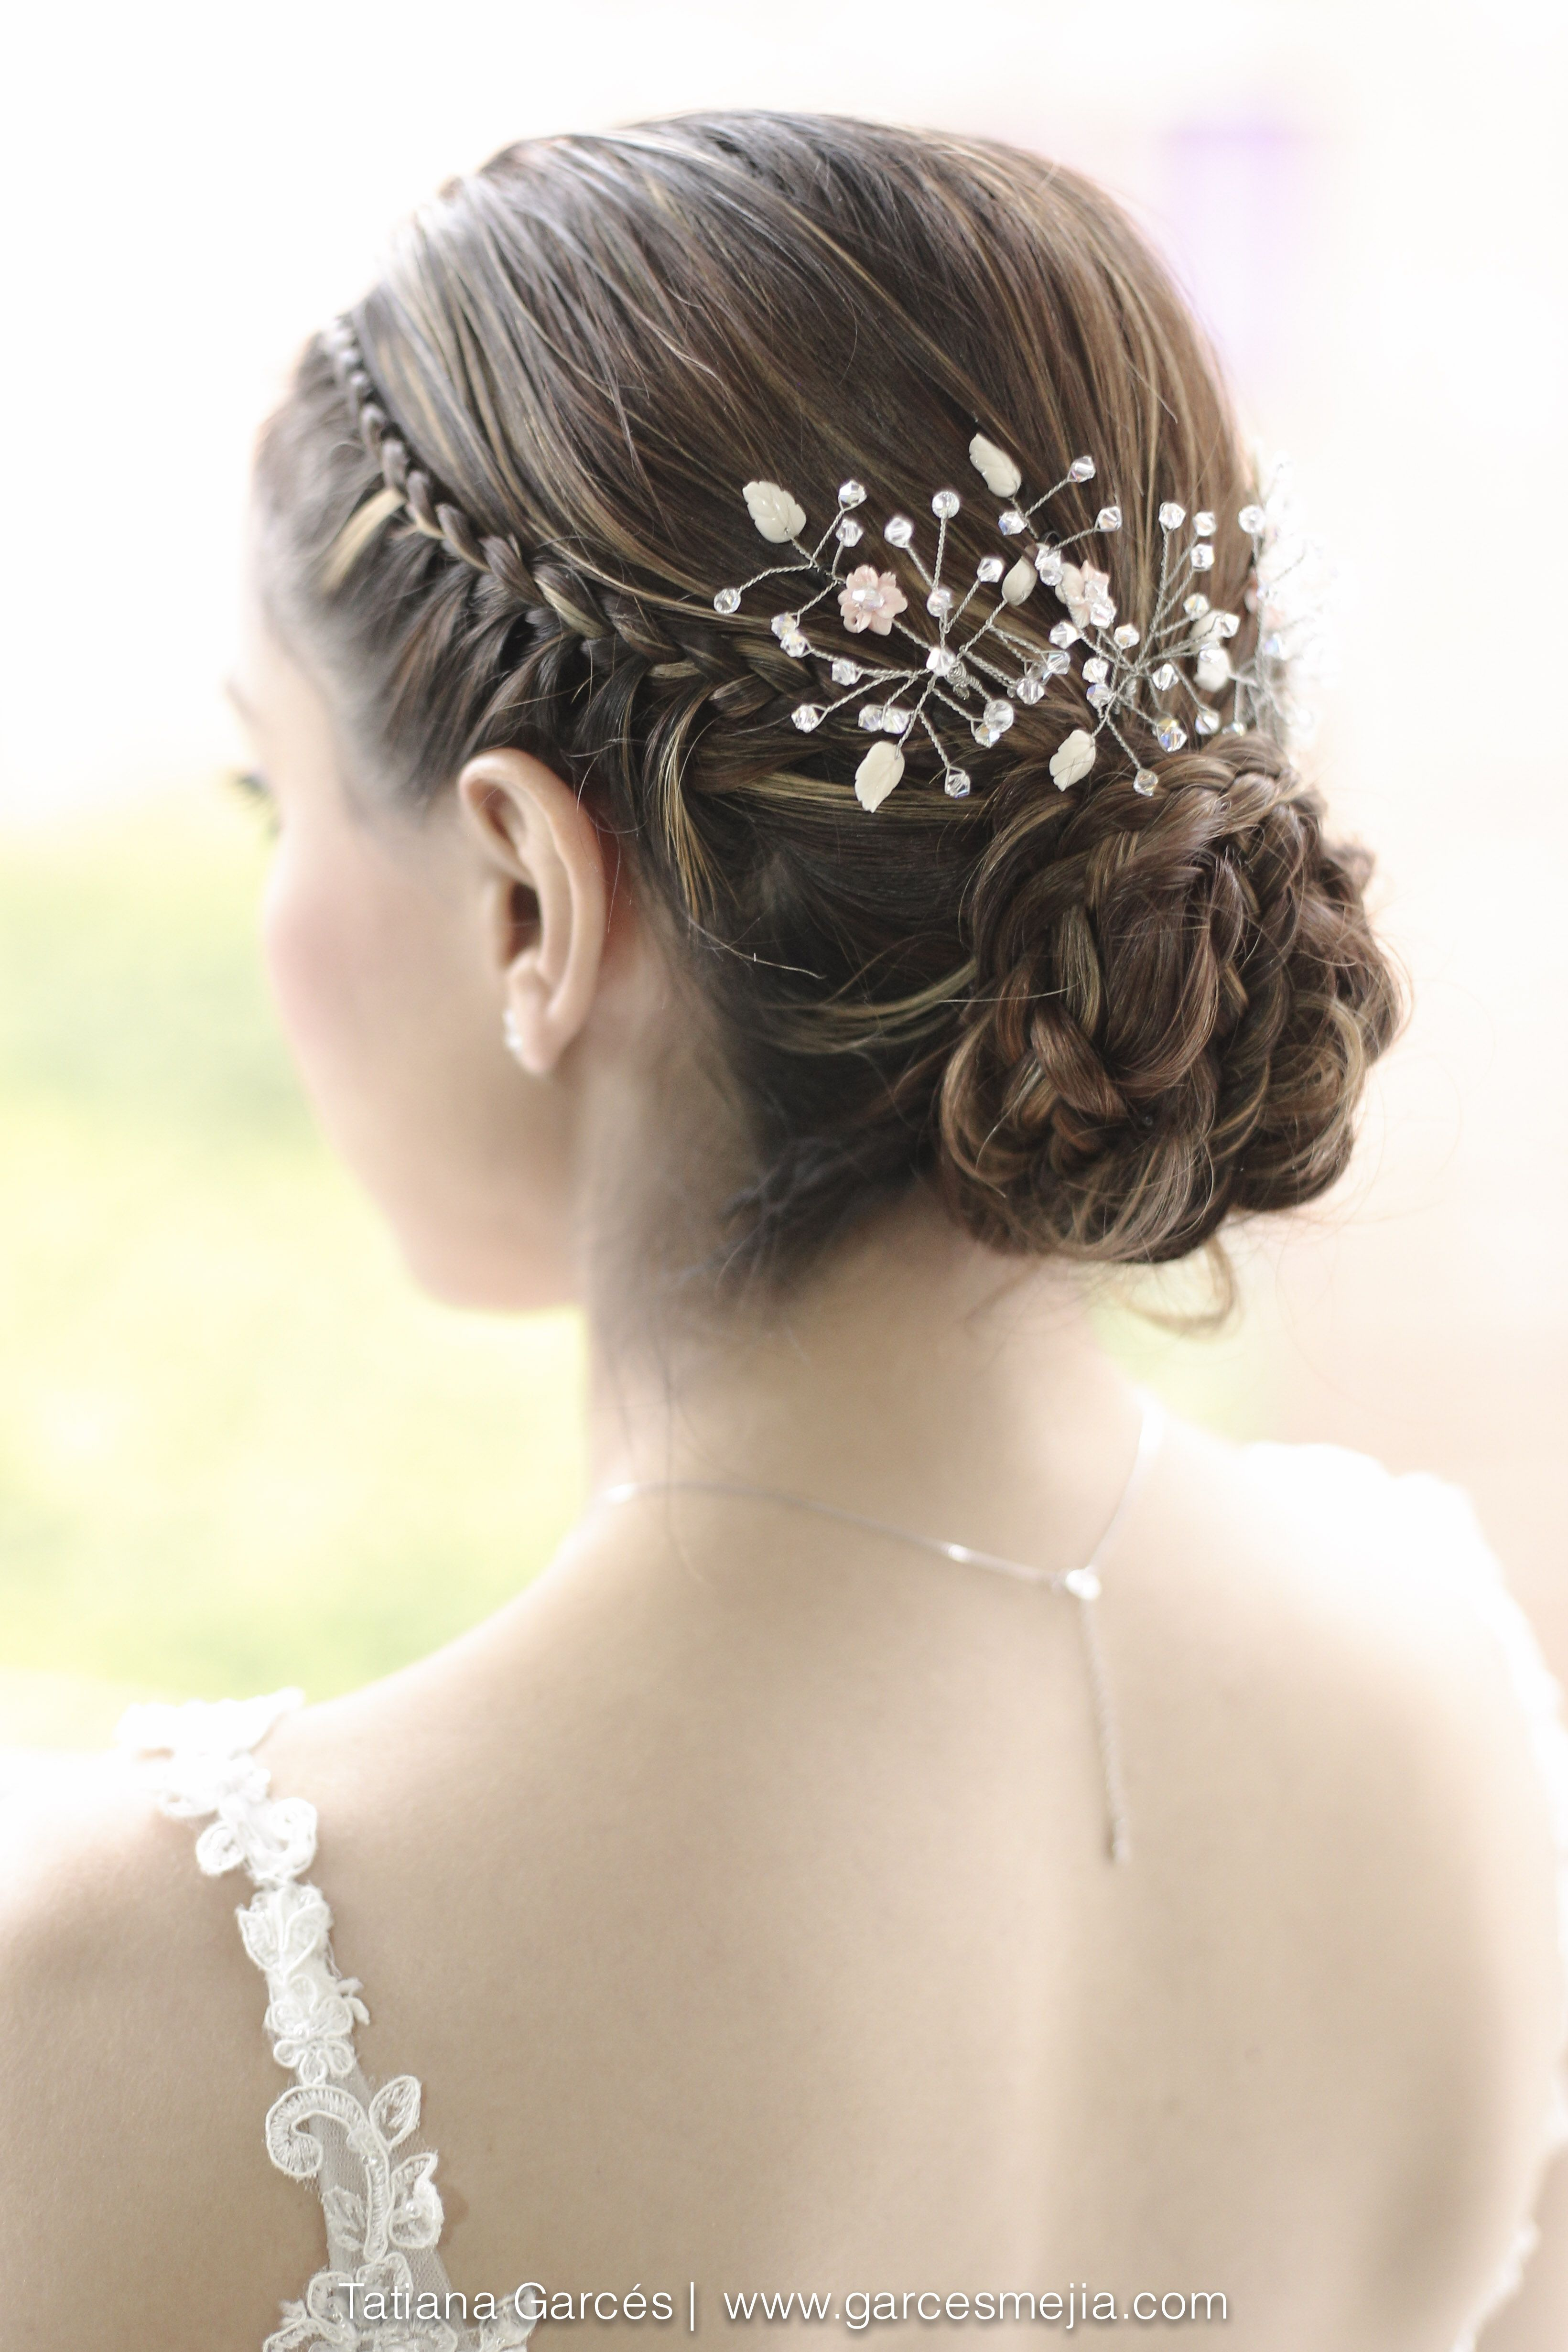 Peinados para novia recogido hairstyle bridal wedding - Peinados recogidos novias ...